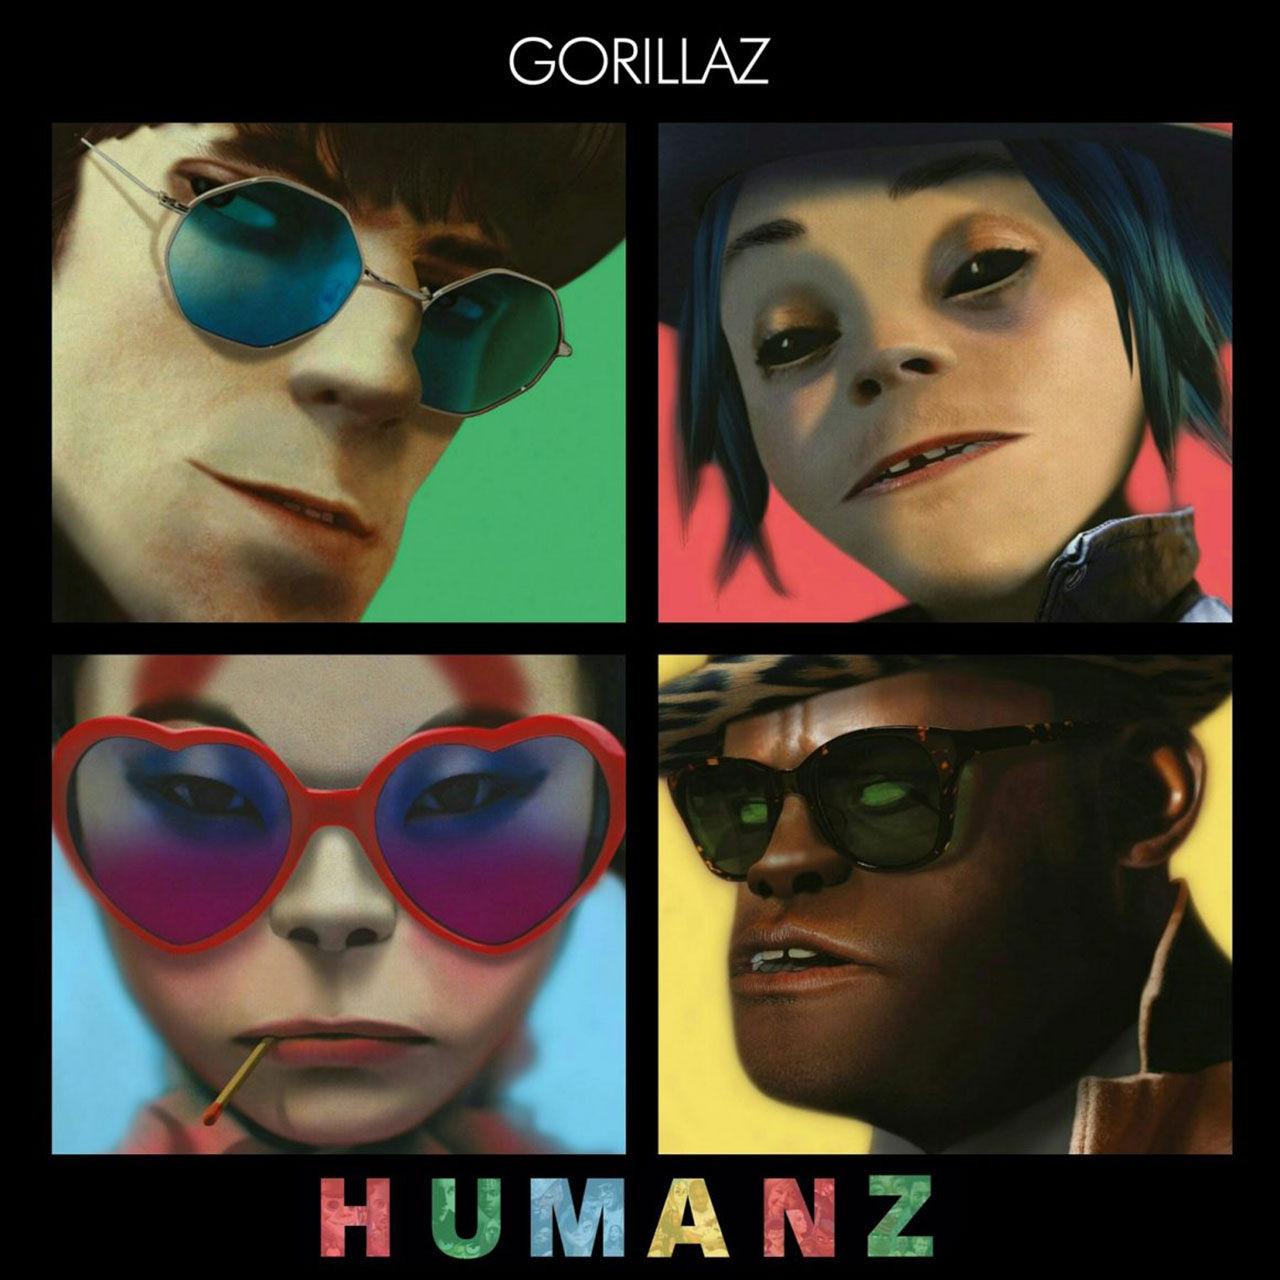 Nu kan du strömma Gorillaz nya album